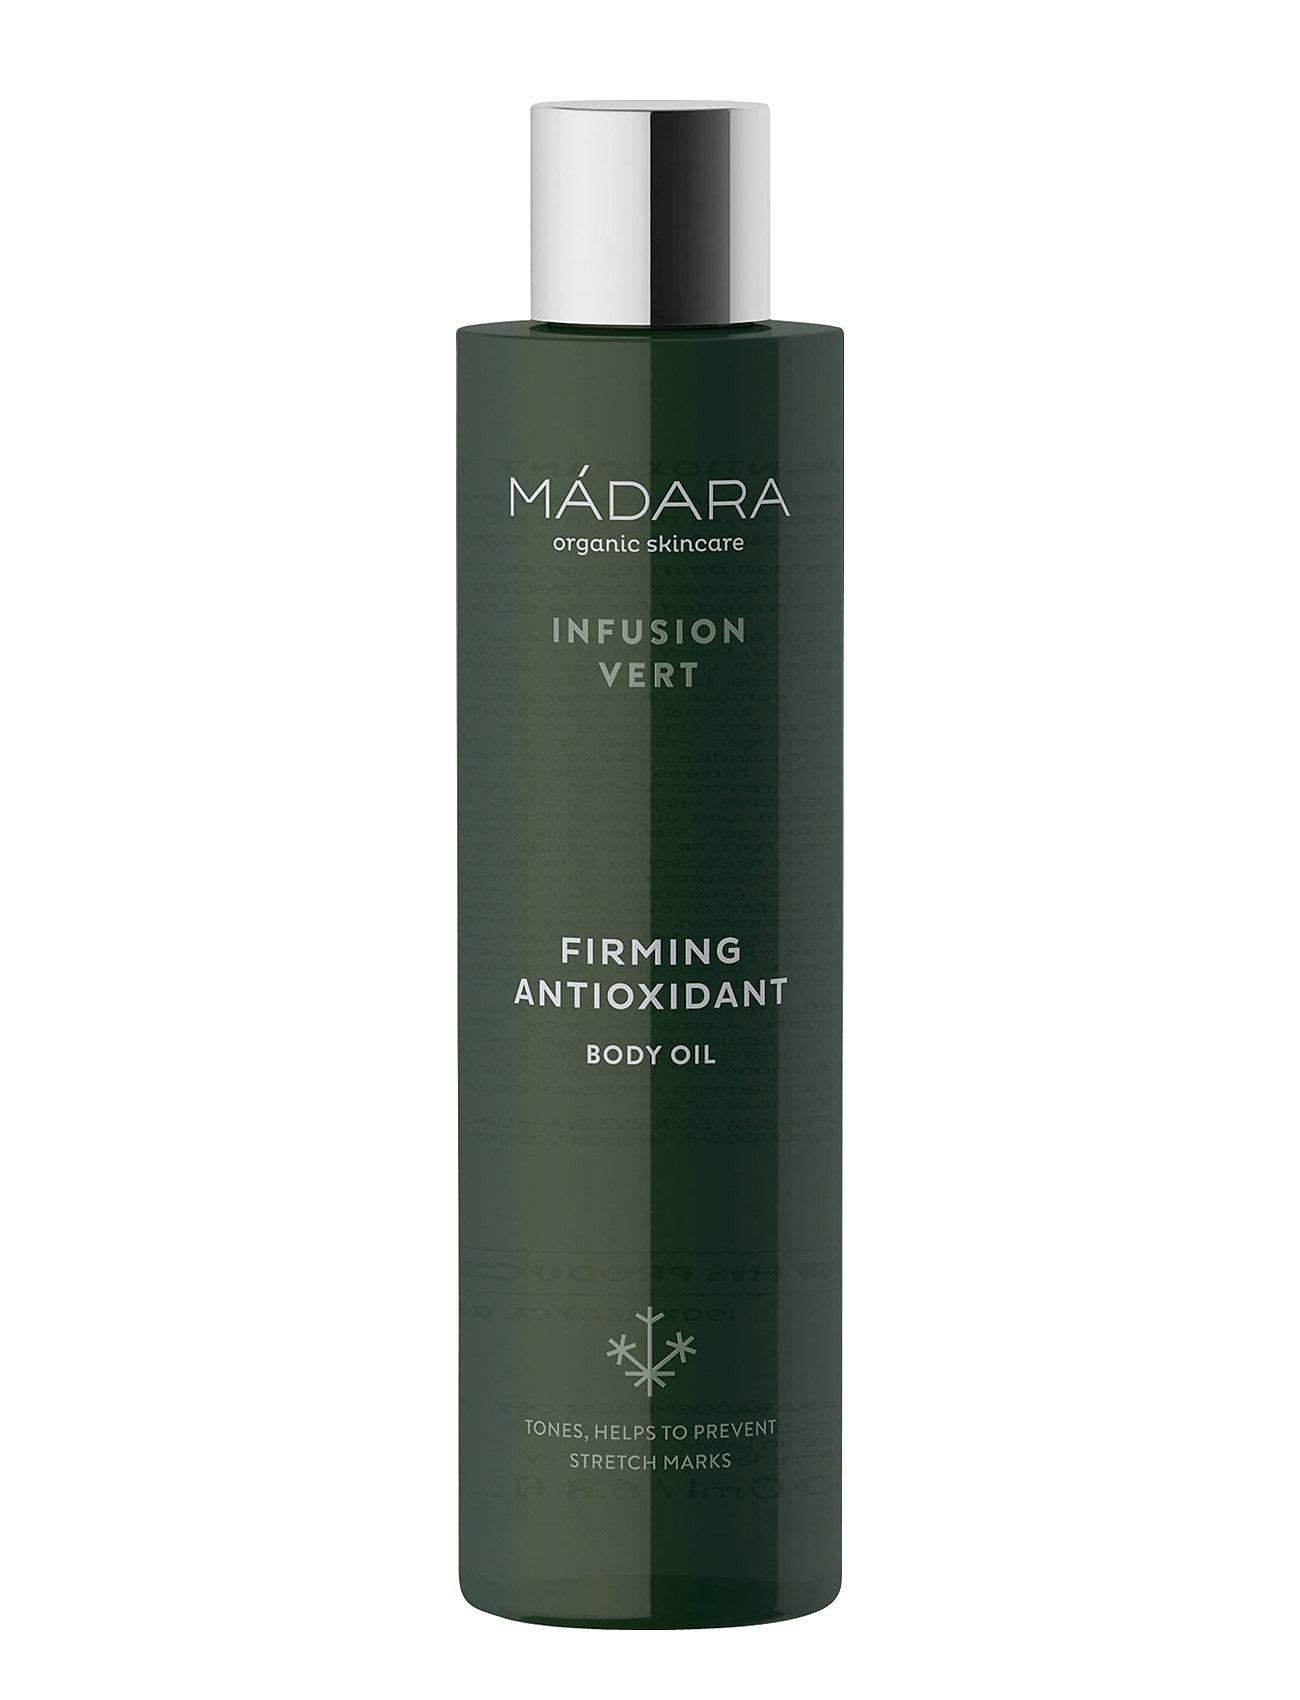 Image of Infusion Vert Firming Antioxidant Body Oil, 200 Ml Beauty WOMEN Skin Care Body Body Oils Nude MÁDARA (3067519531)